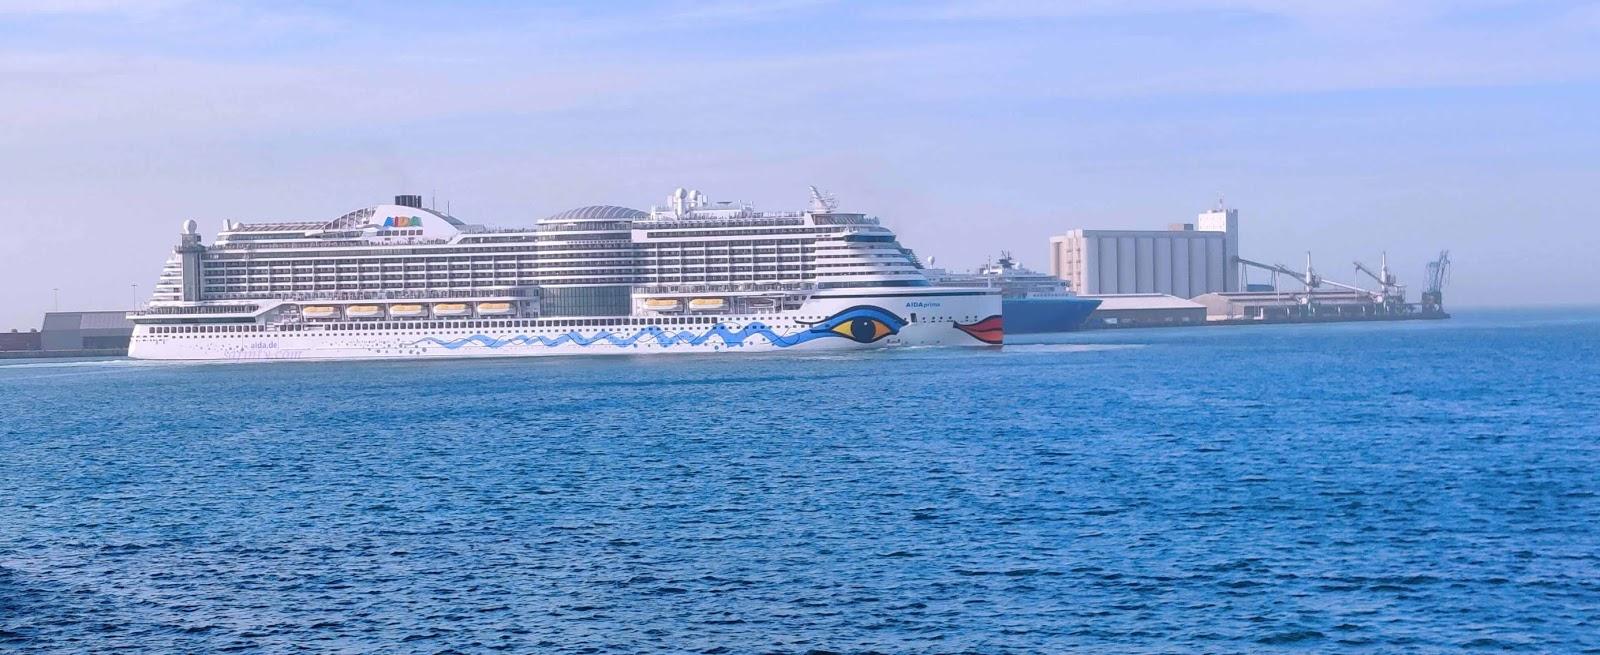 aida prima , aida cruises , cruise vessel